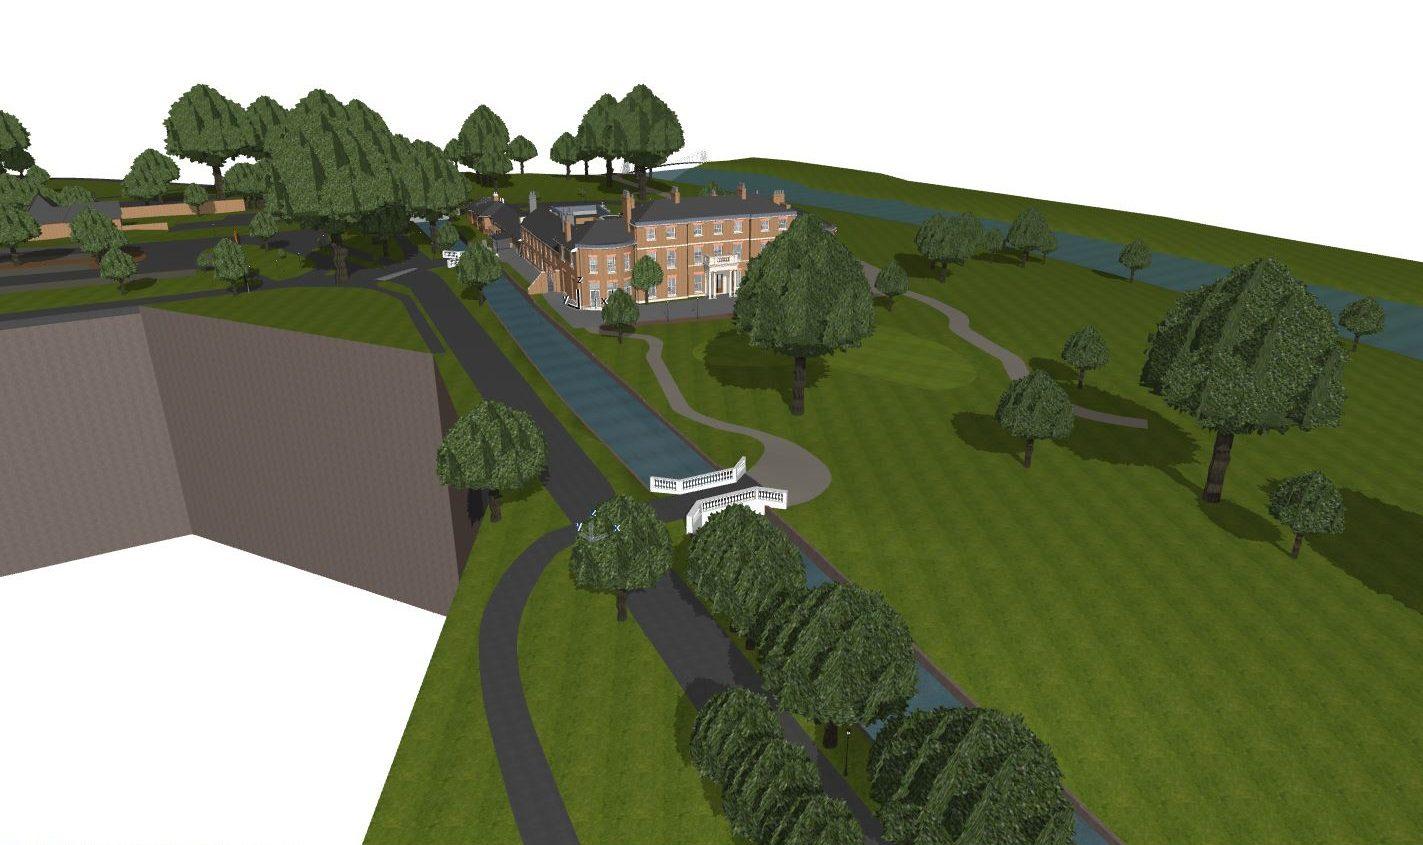 Archicad, Revit terrain modeling | Professional CAD